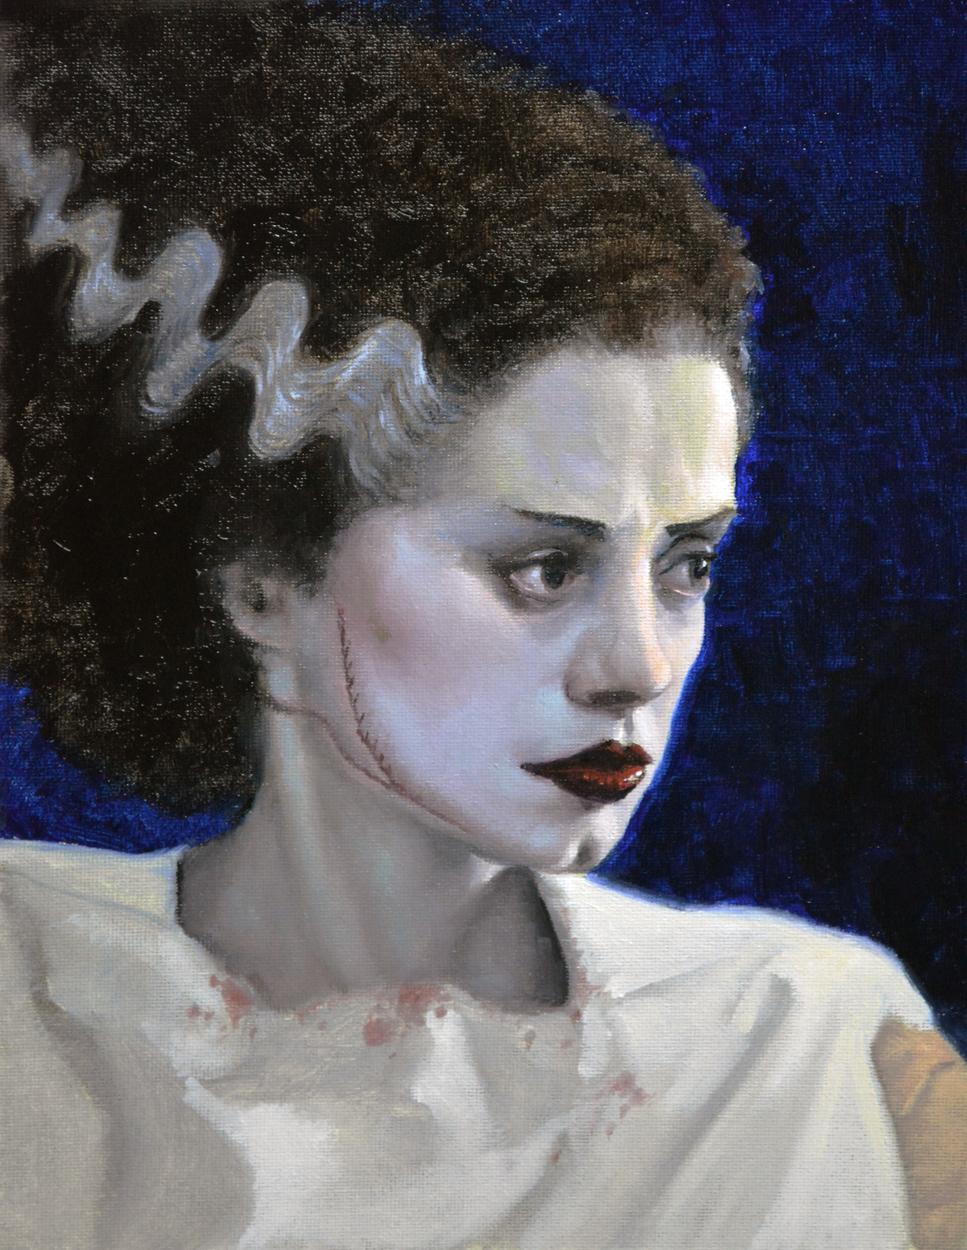 The Bride Artwork by Armand Cabrera